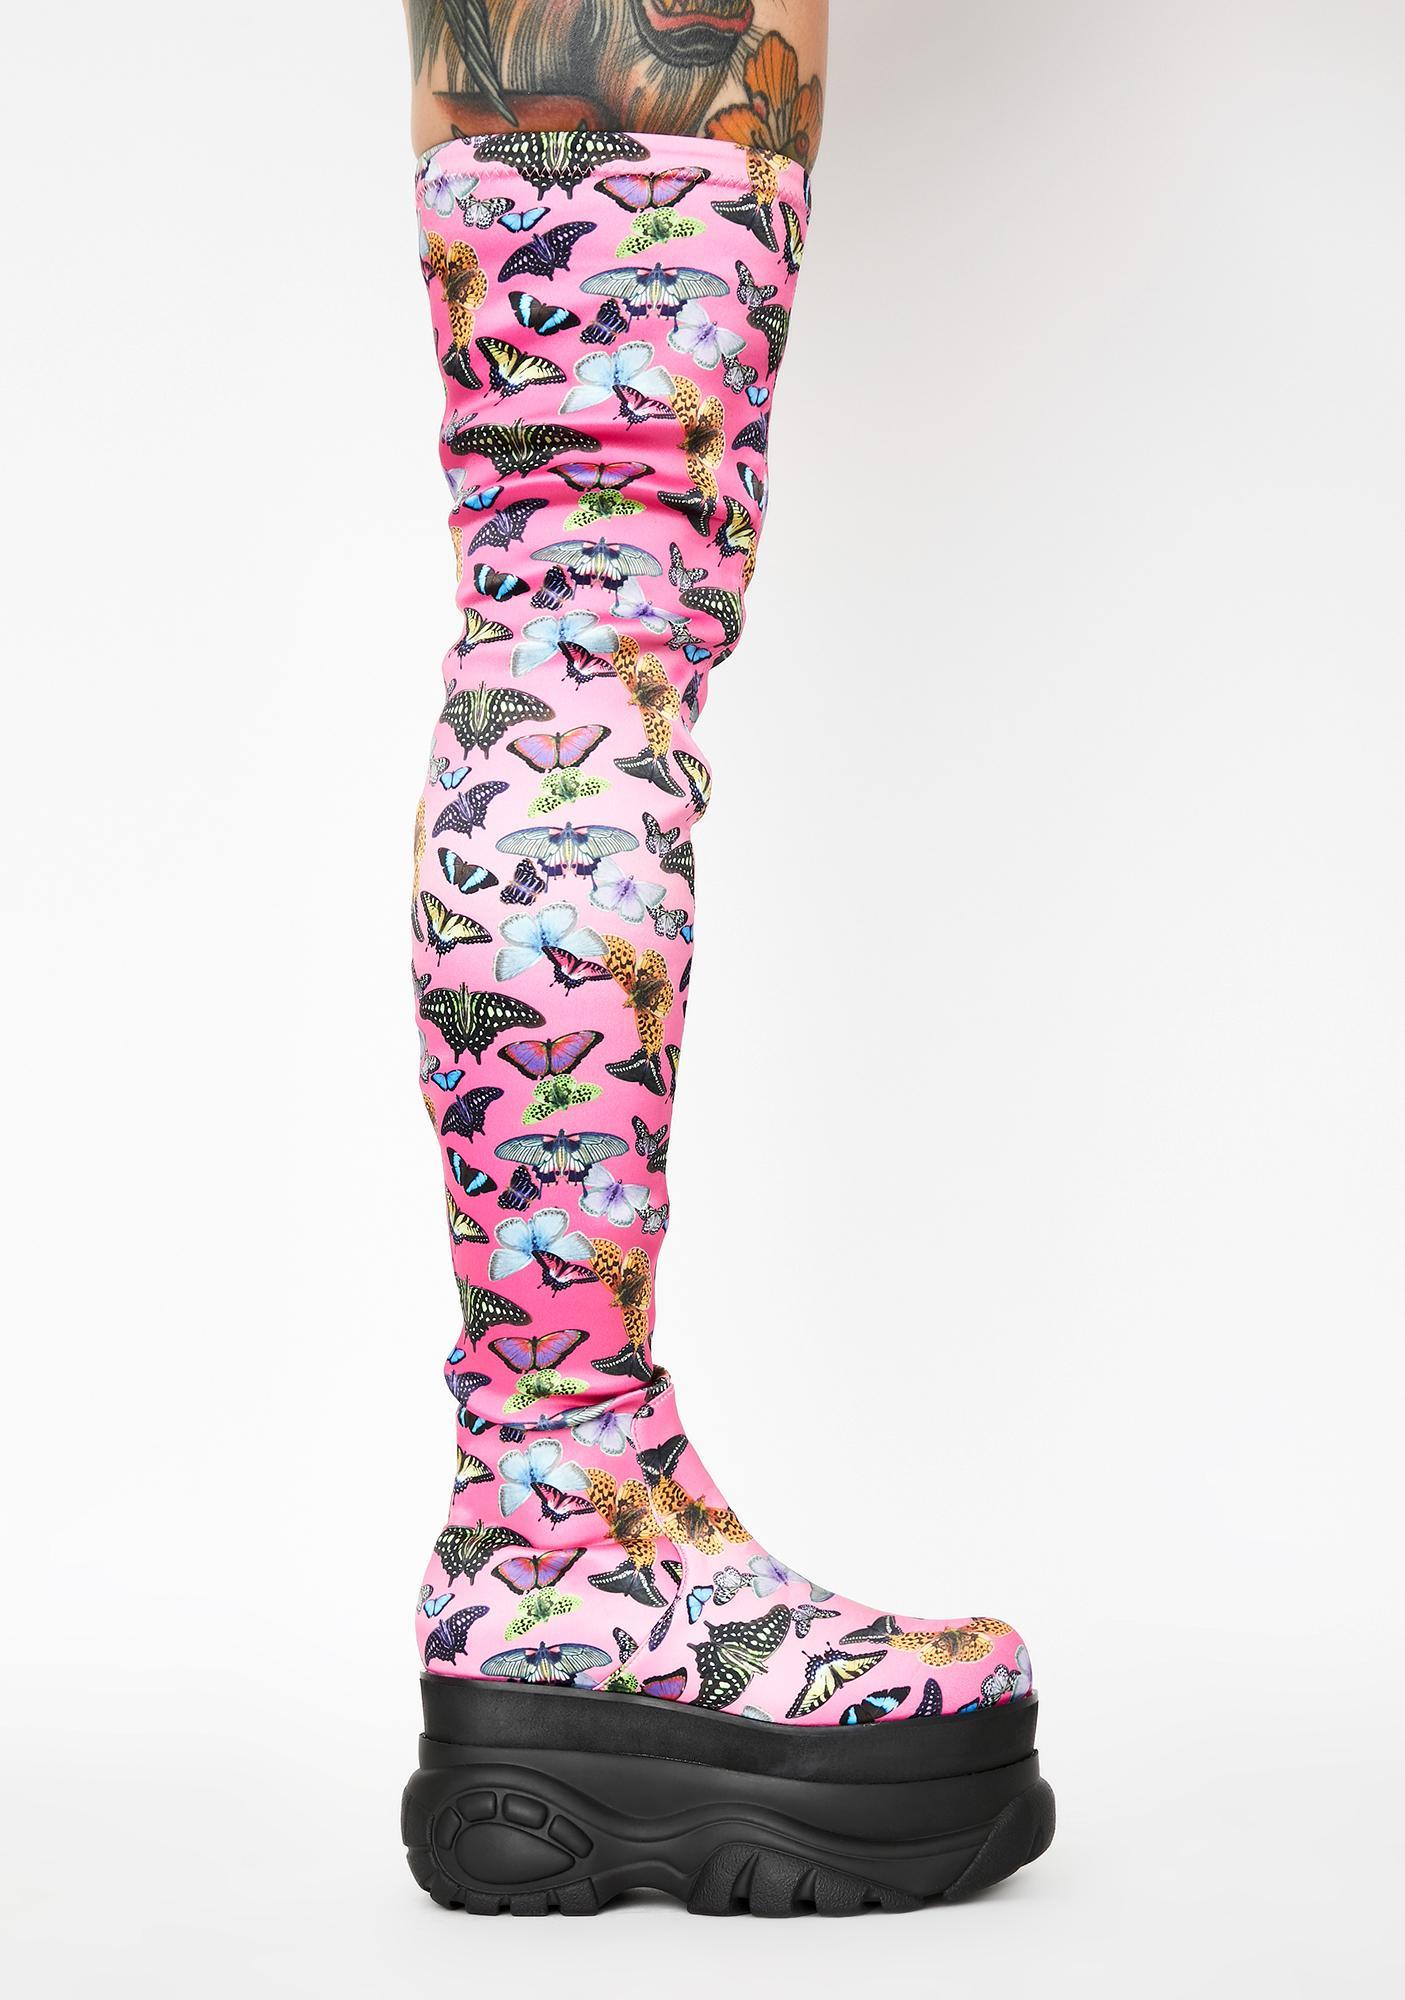 Club Exx Lovebug Thigh High Boots